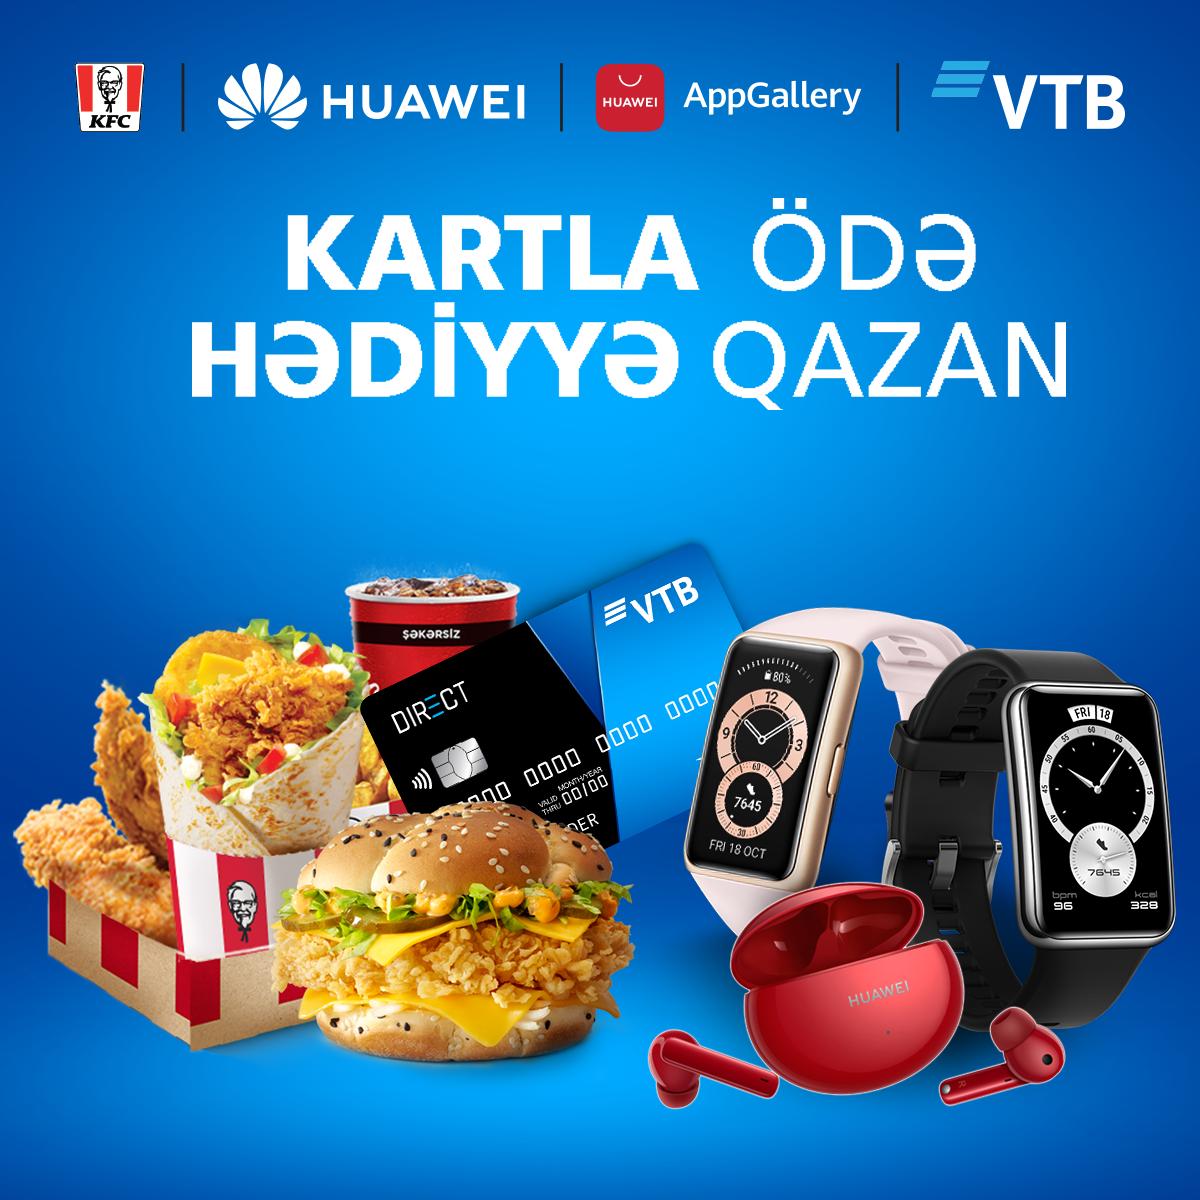 ВТБ (Азербайджан) совместно с KFC дарят гаджеты Huawei